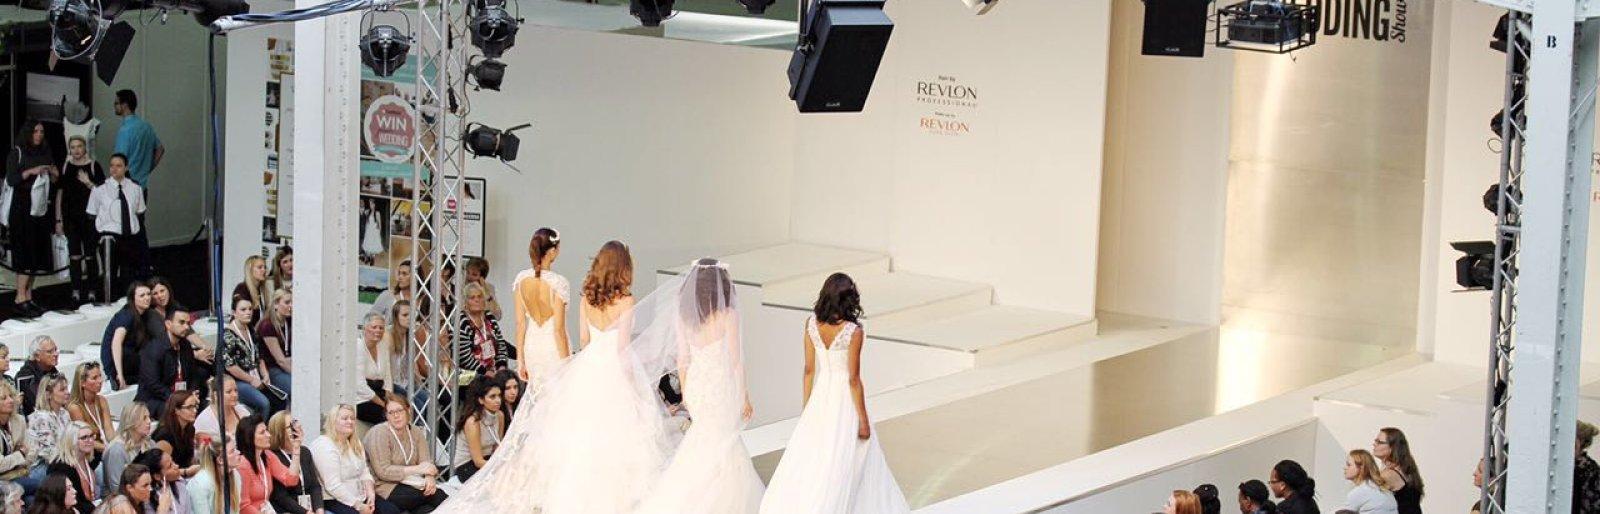 The UK National Wedding Show